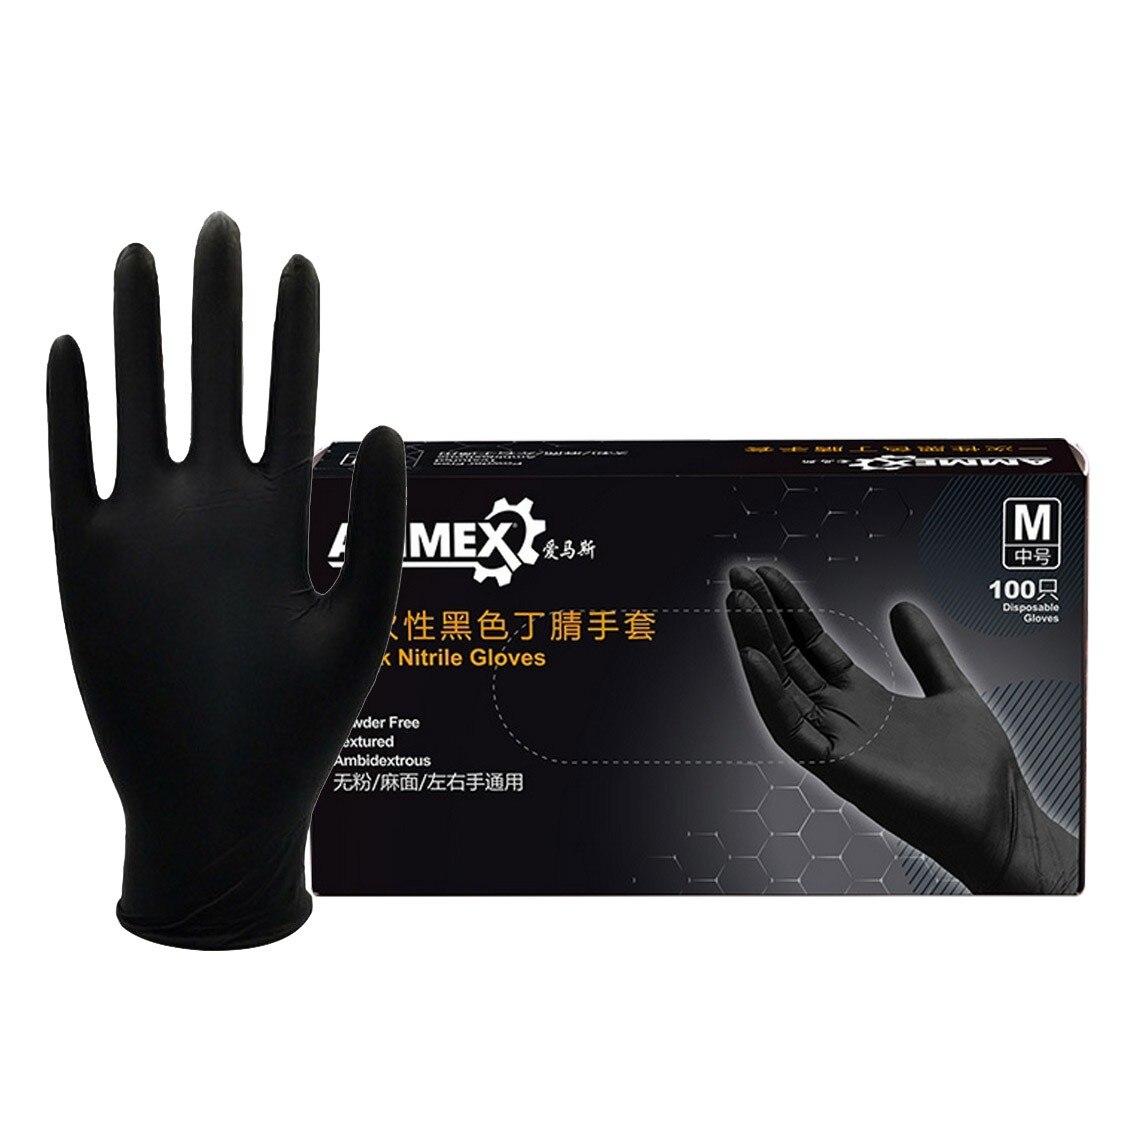 Guantes de goma para lavar platos negros cómodos guantes desechables mecánicos de nitrilo guantes de examen guantes para lavar platos